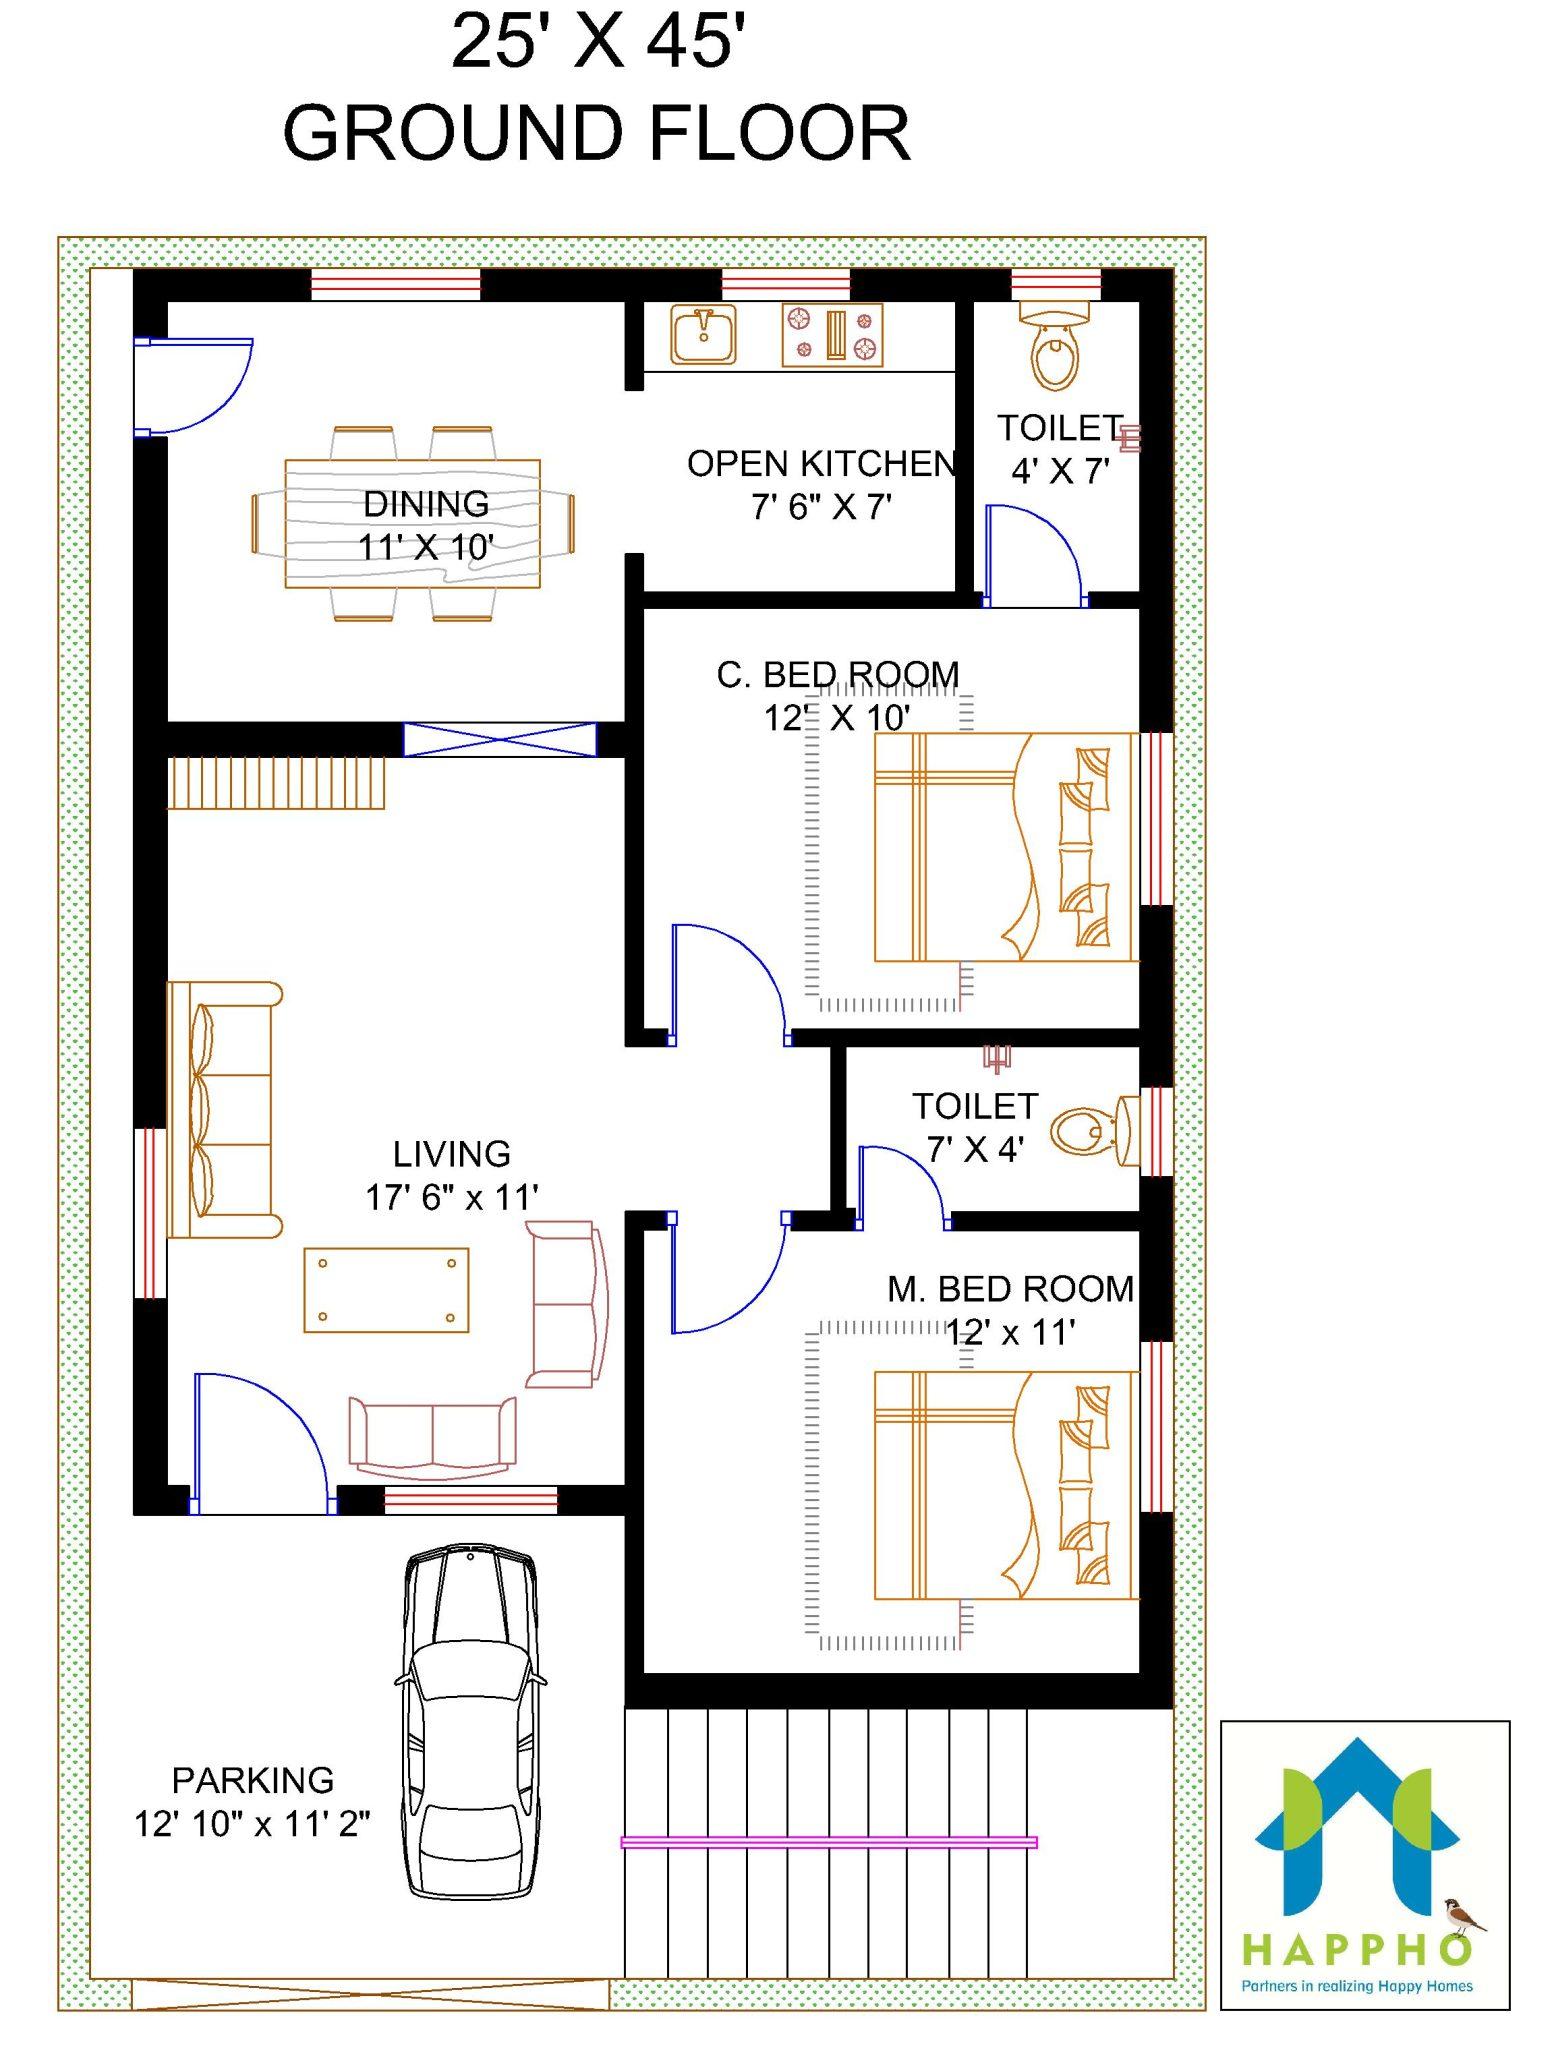 Floor Plan For 25 X 45 Feet Plot 2 BHK 1125 Square Feet